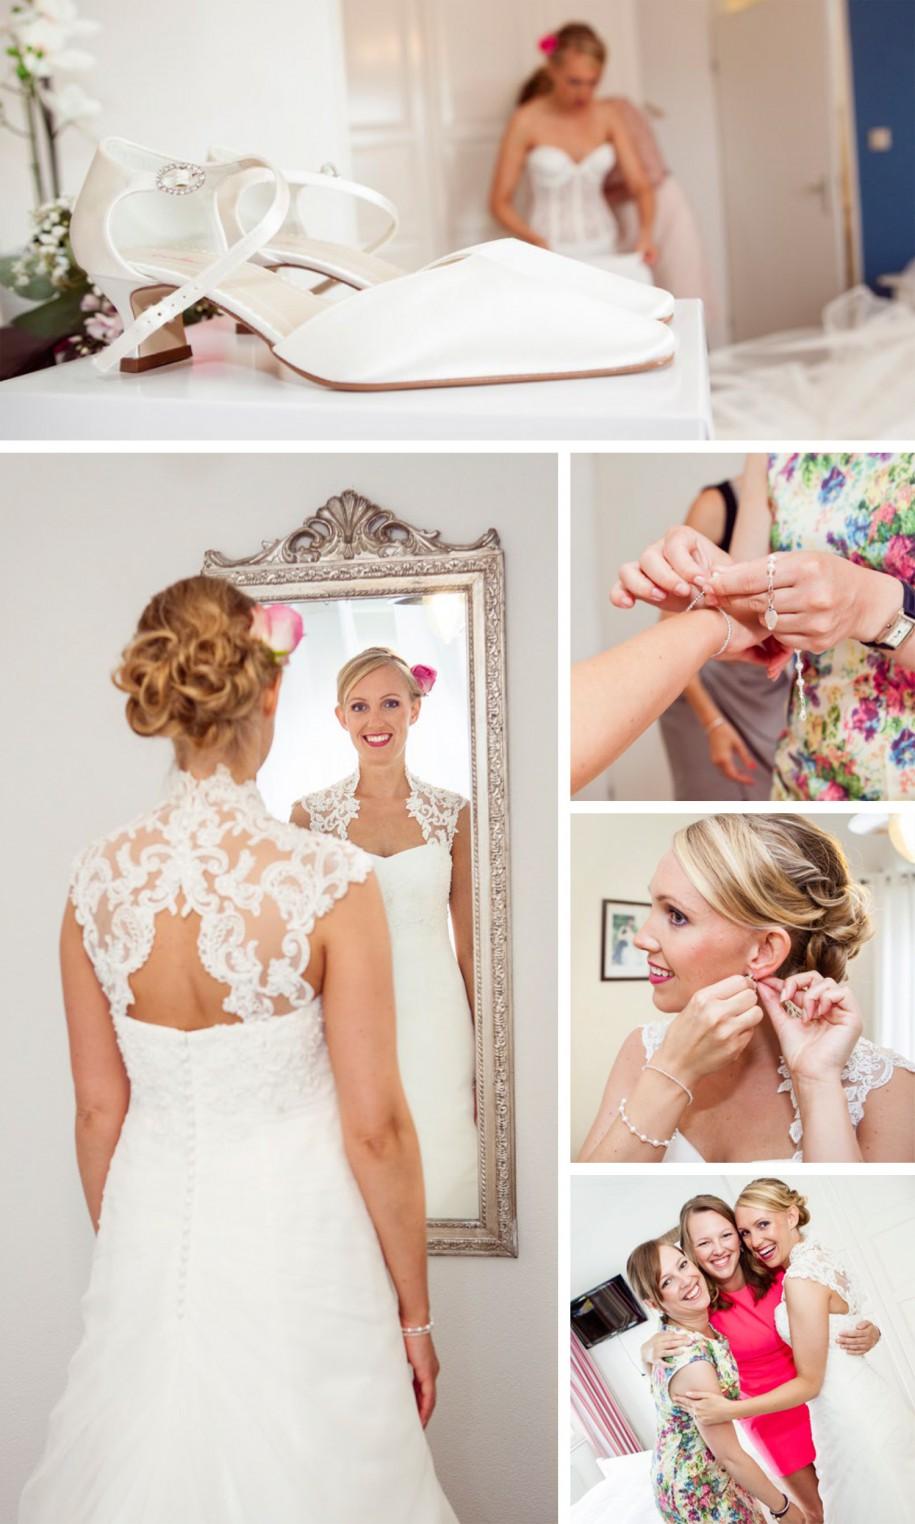 bruidsreportage-bas-driessen-fotografie-marc-narda-blog-01